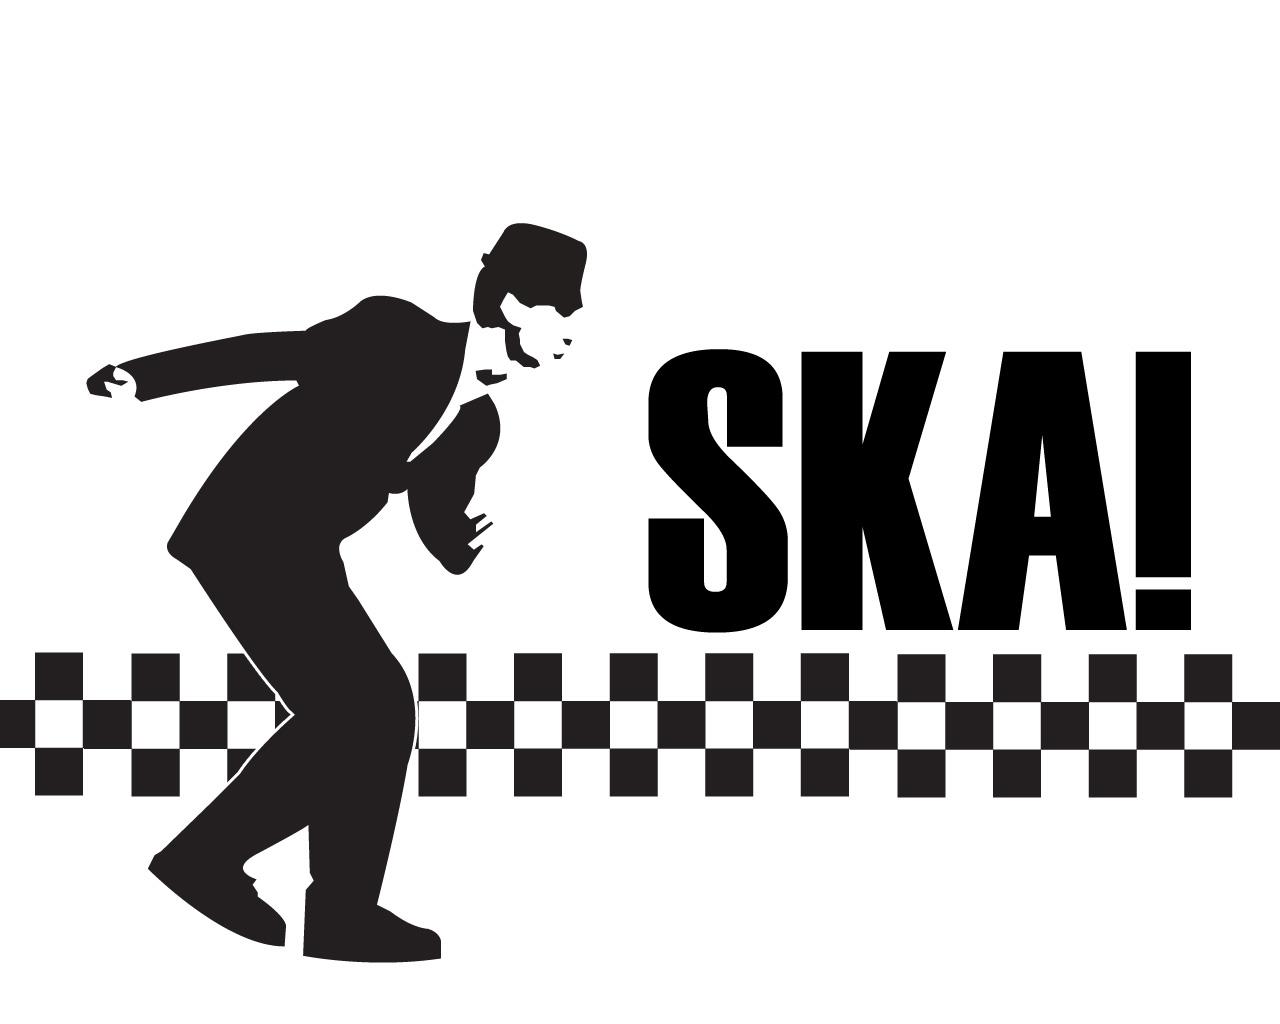 Ska and reggae are distinguishable